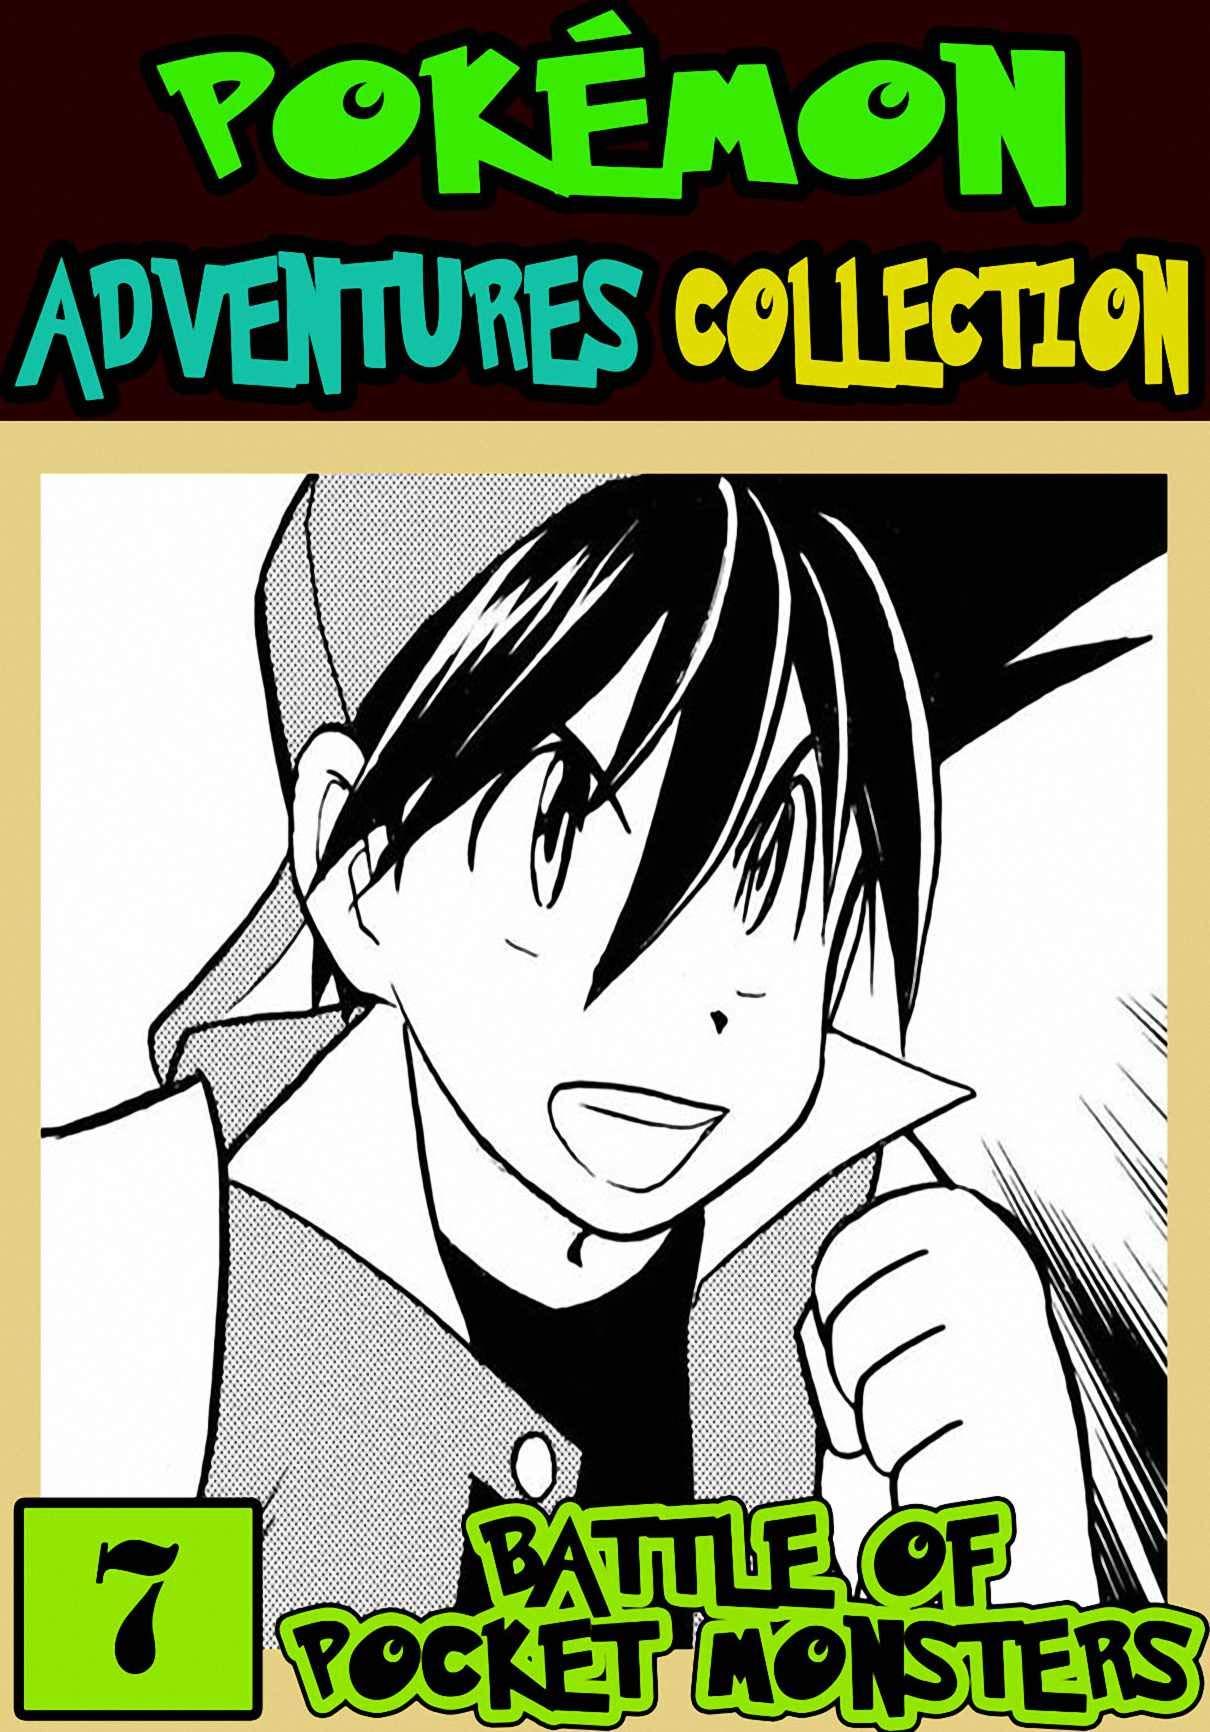 Battle Of Pocket Monster: Collection 7 - Pokemon Collection Adventures Manga Graphic Novel For Boys, Girls, Kids